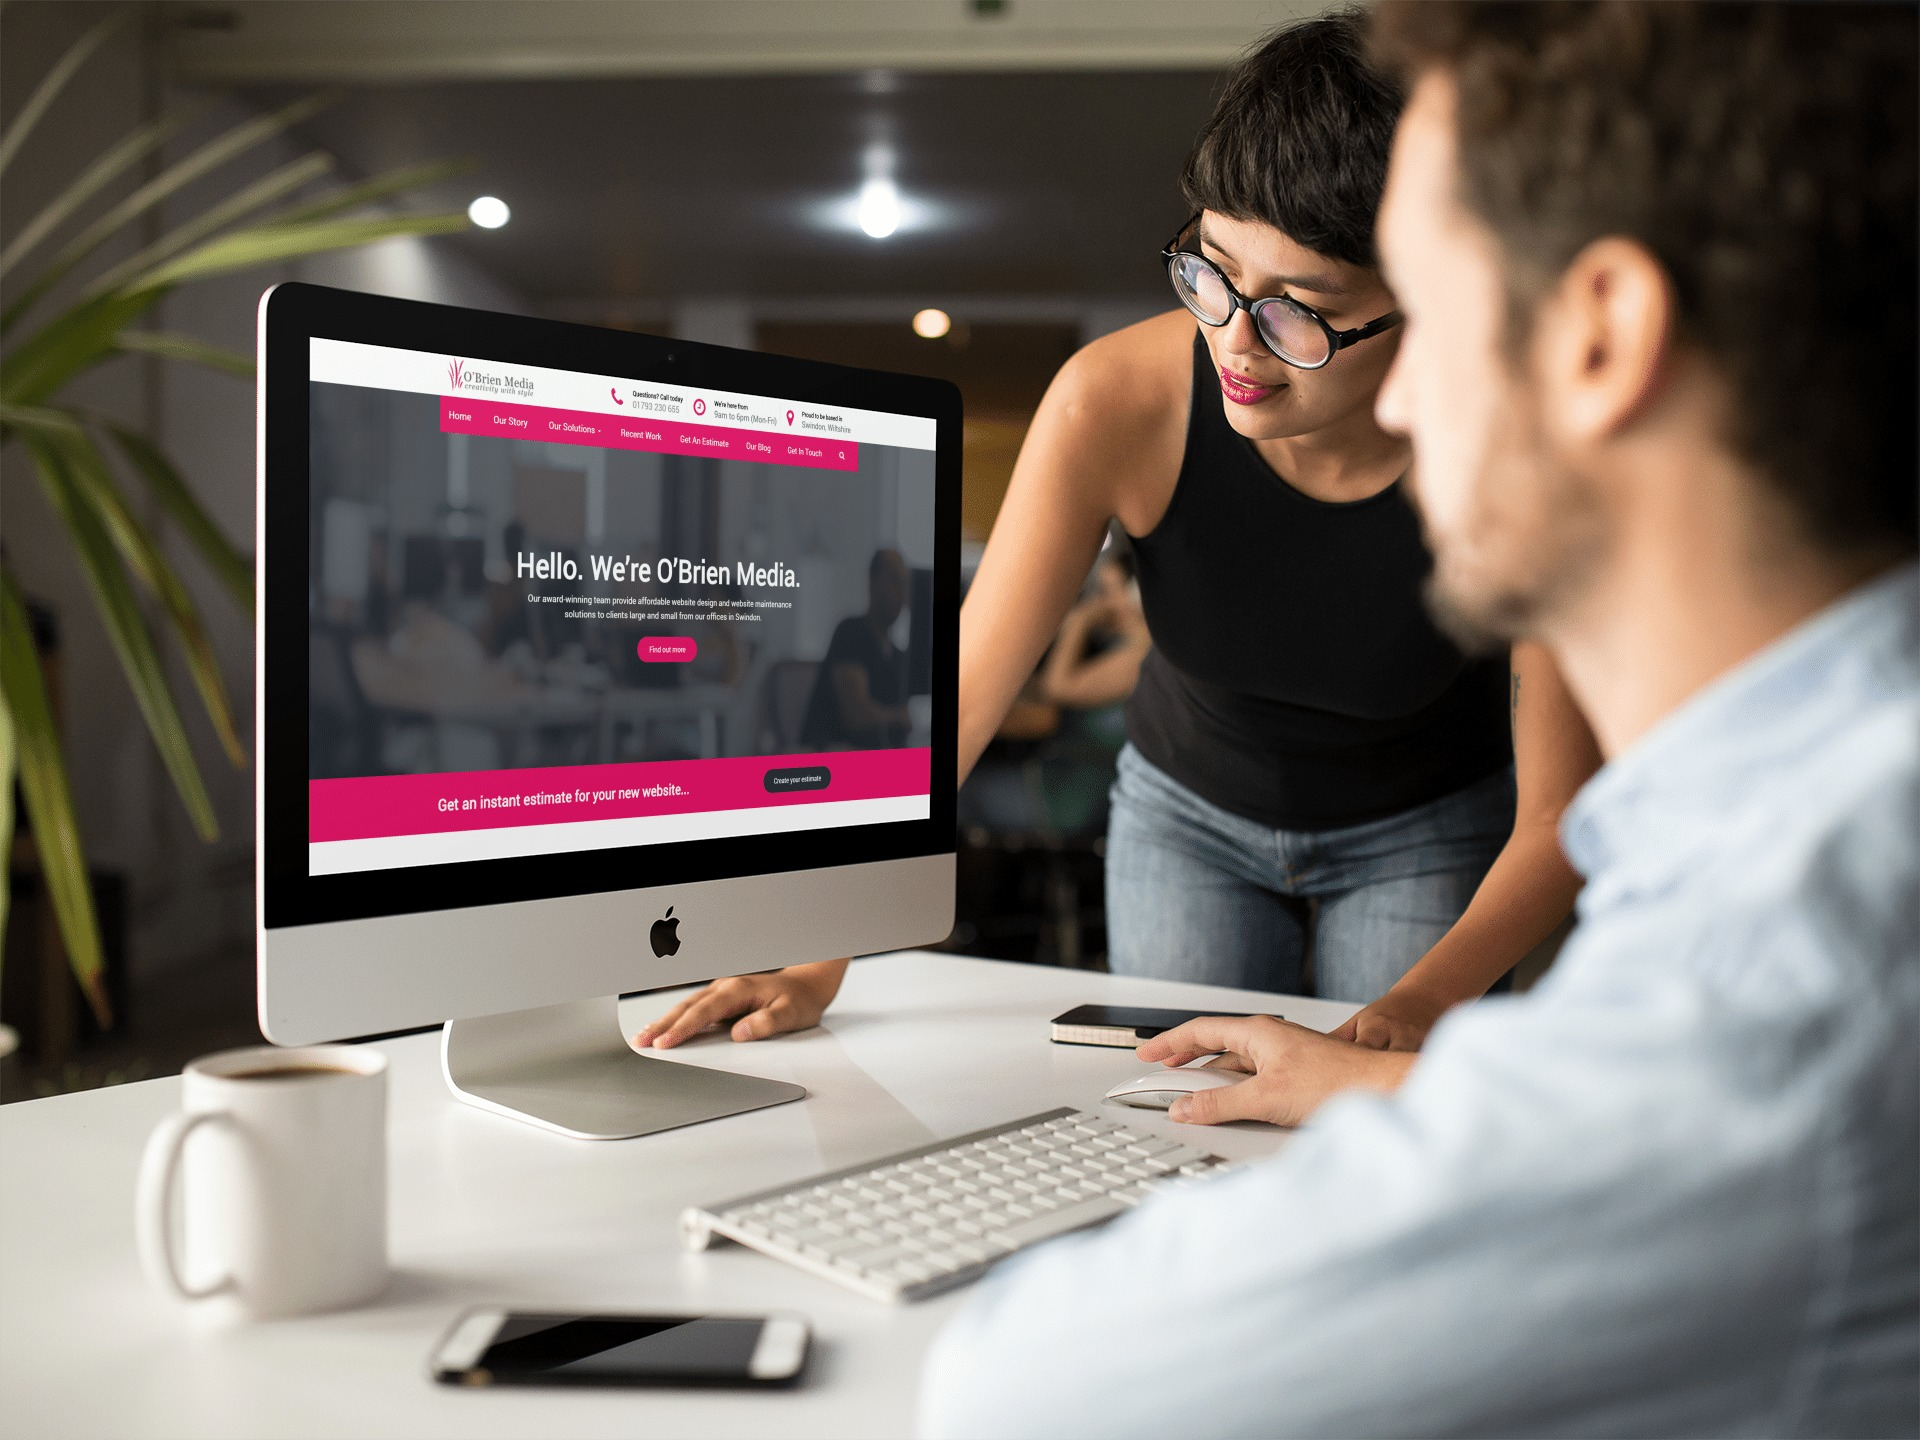 Swindon web design company O'Brien Media is Living Wage employer